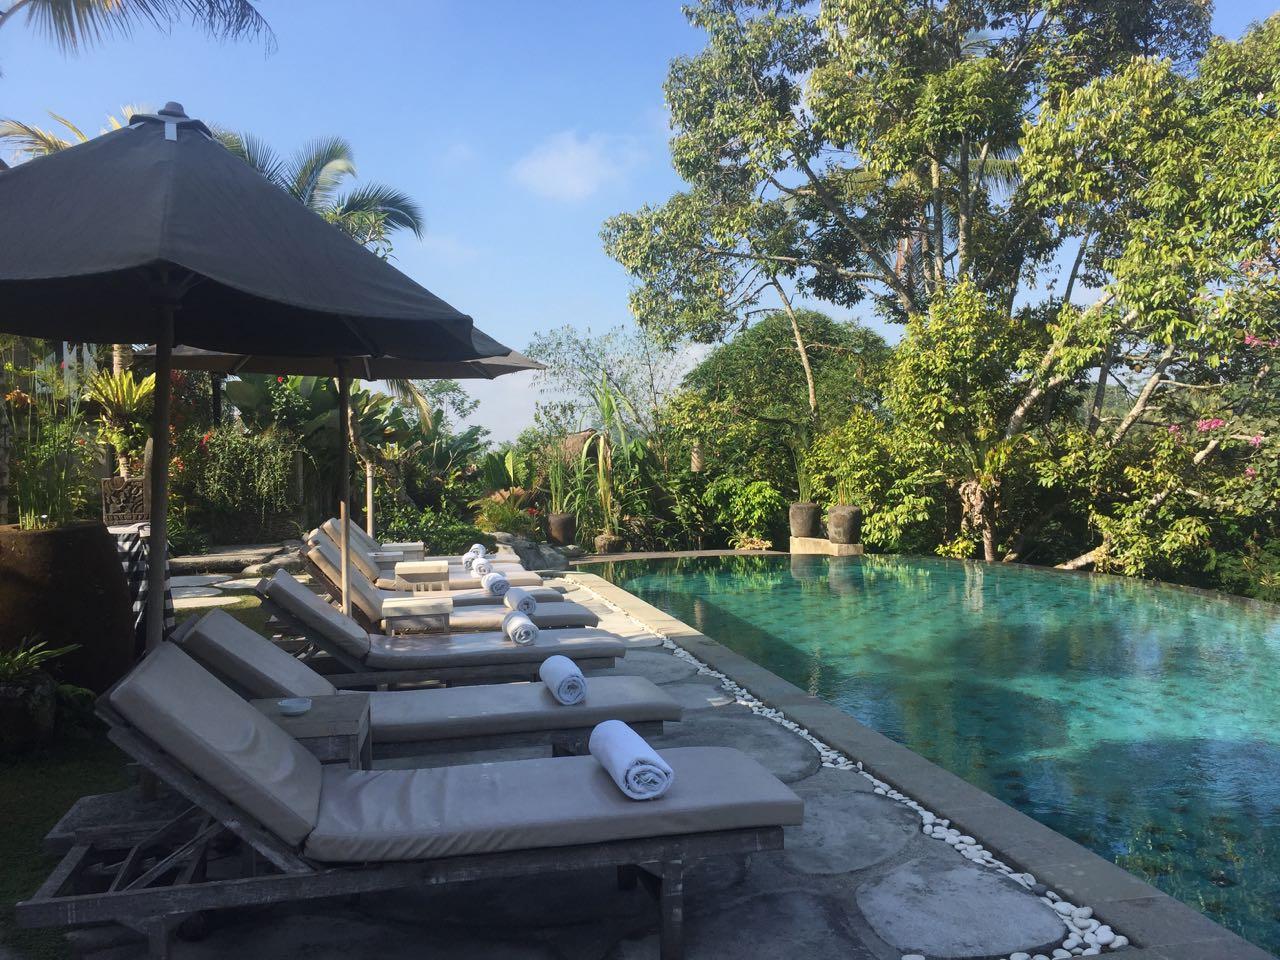 Hotel Puri Tanah Lot Indonesia Sucheta Rawal